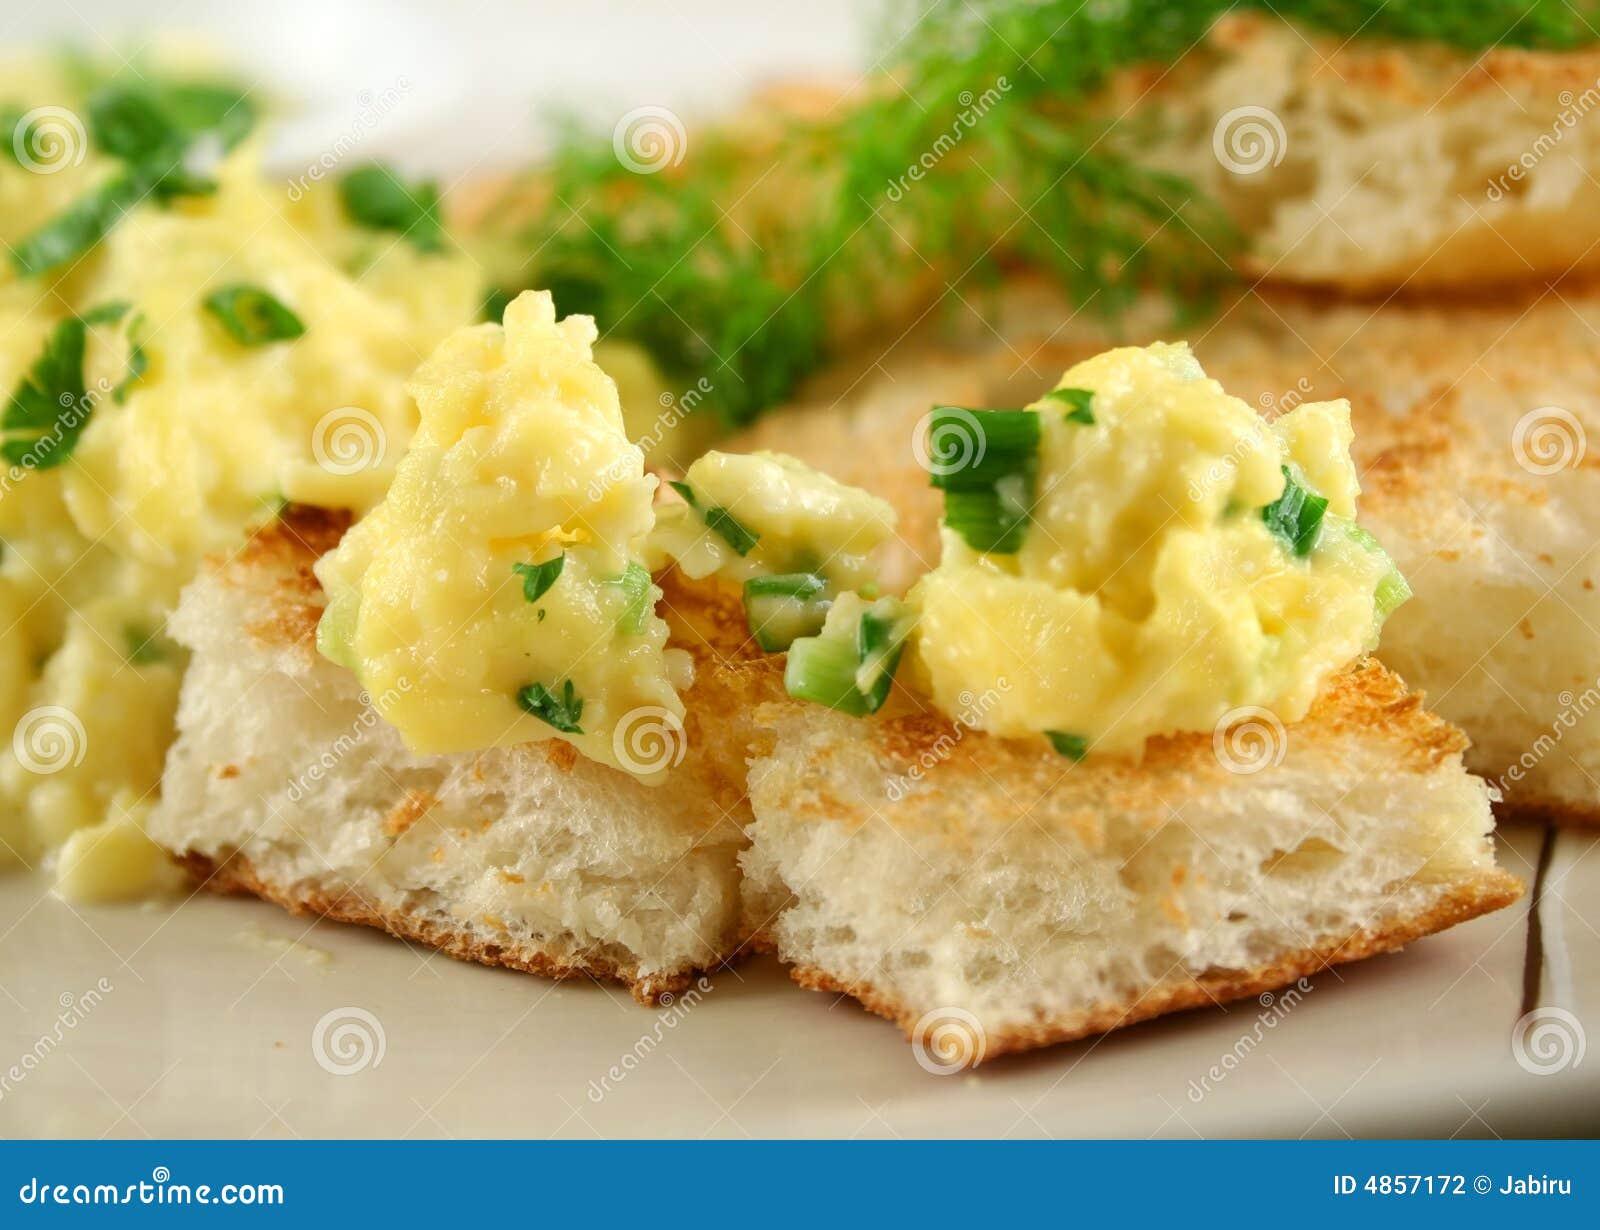 Scrambled Eggs On Toast Stock Photography - Image: 4857172